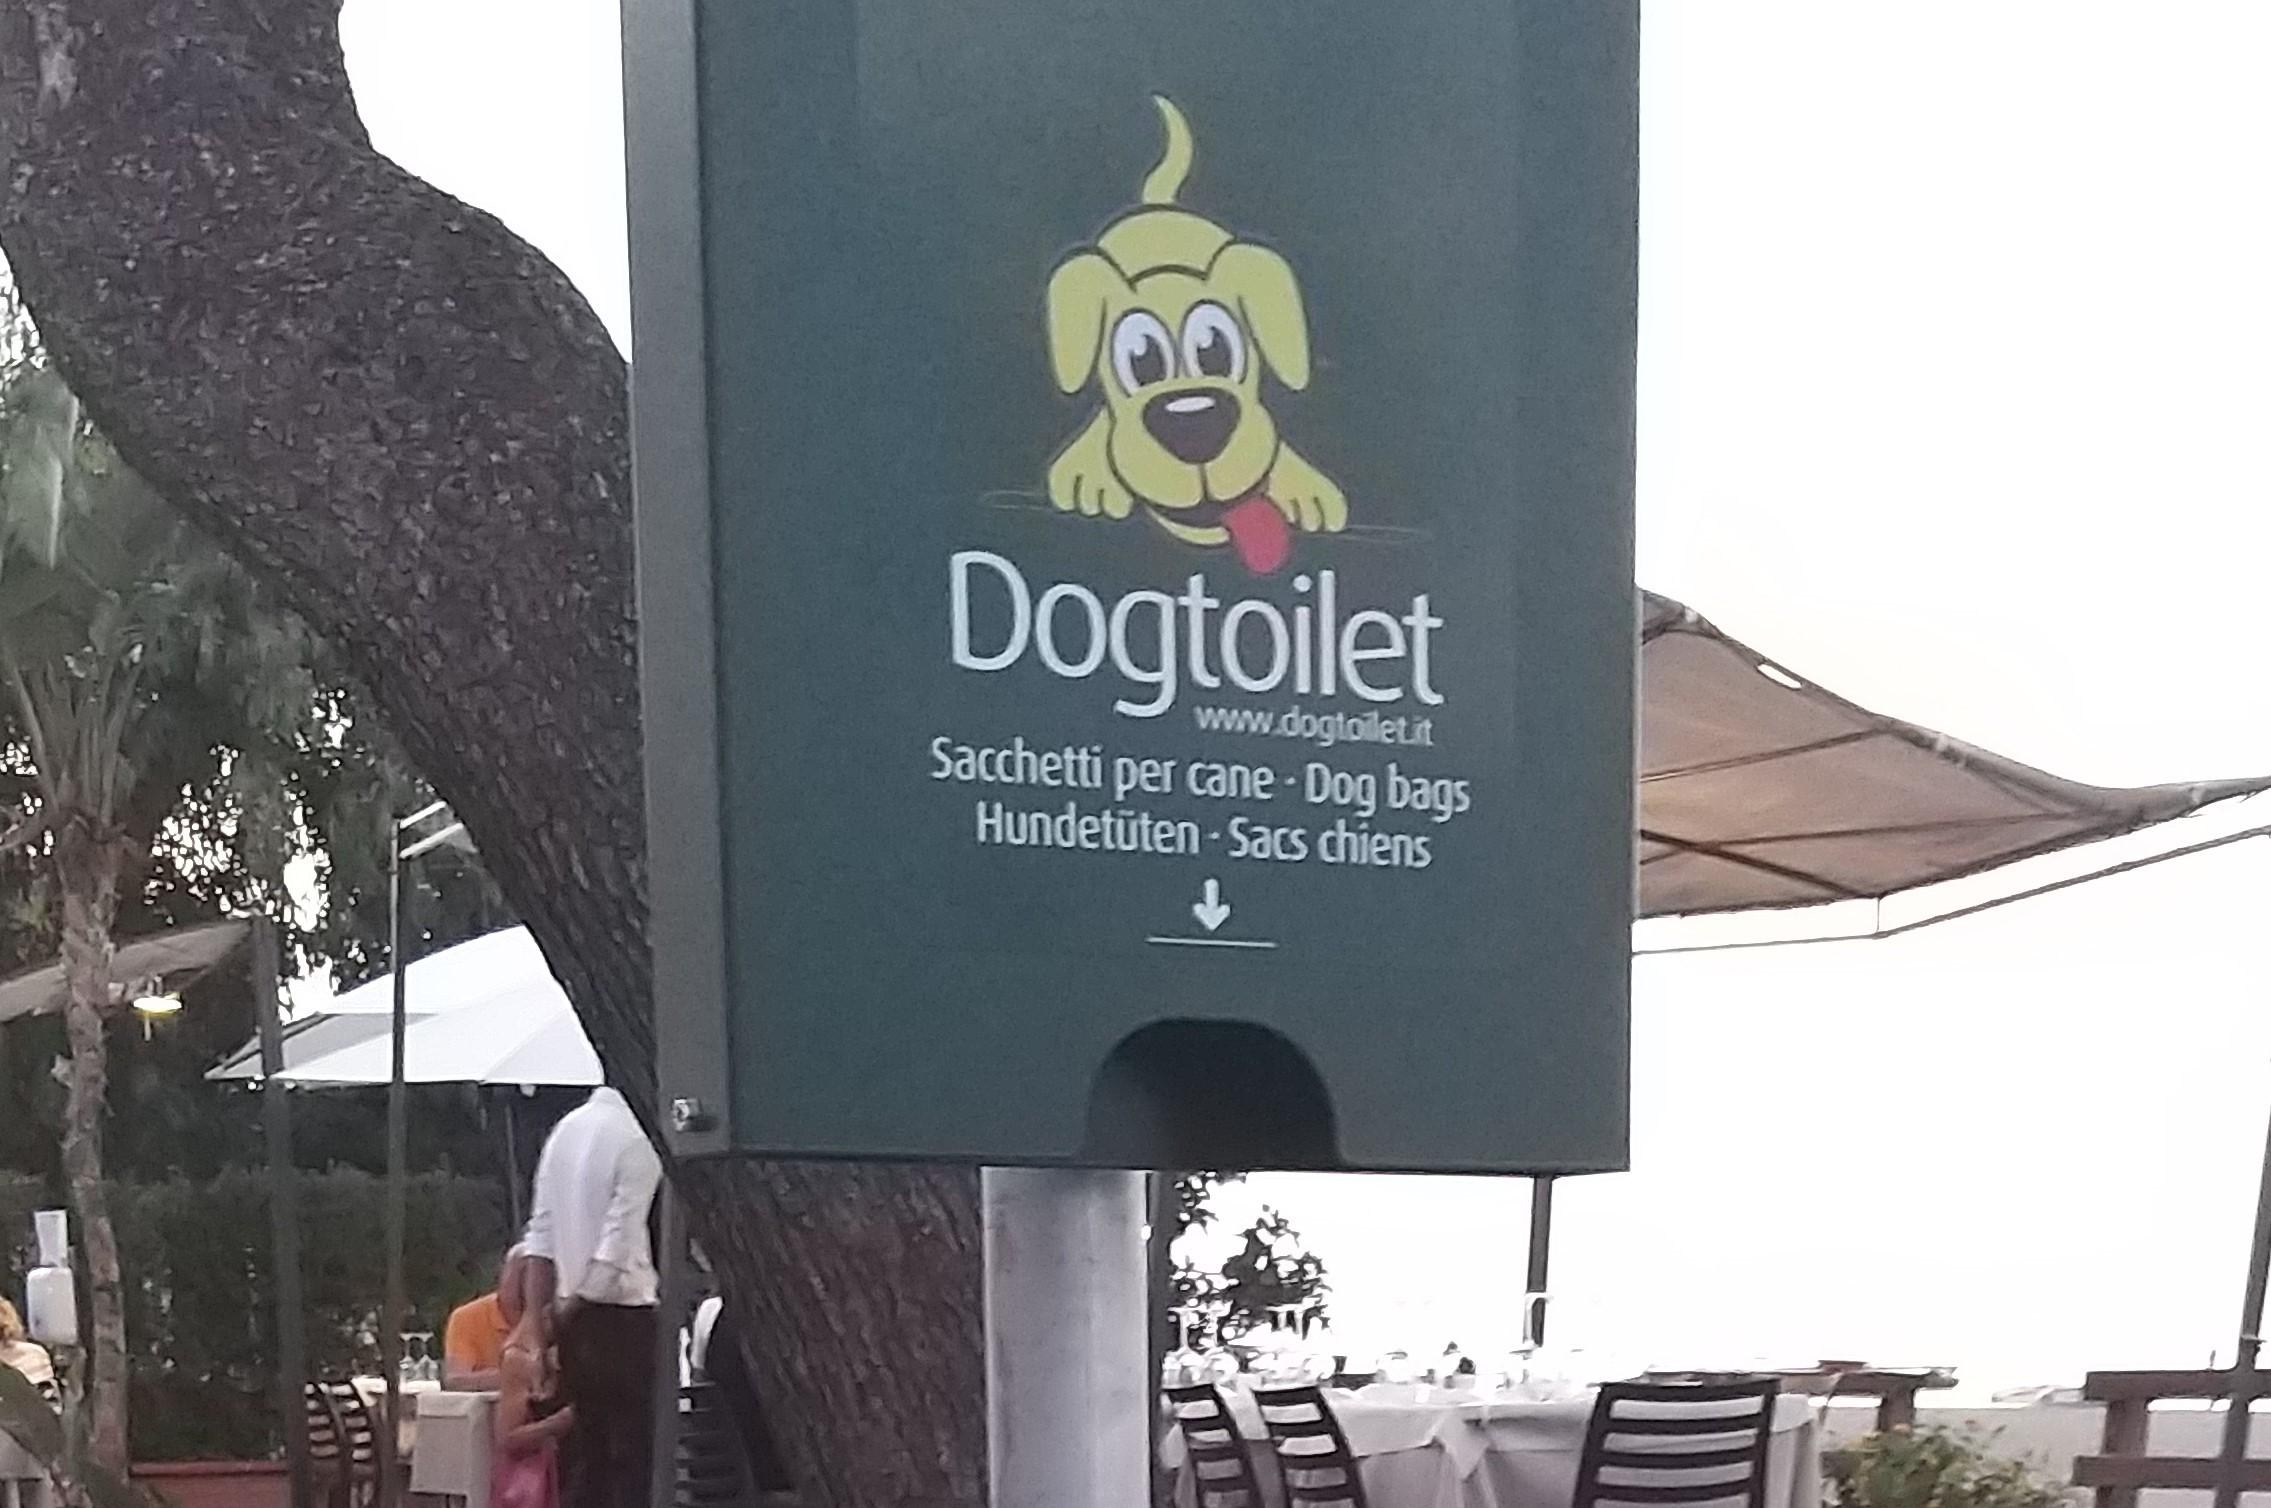 Dogtoilet  galateo per proprietari di cani